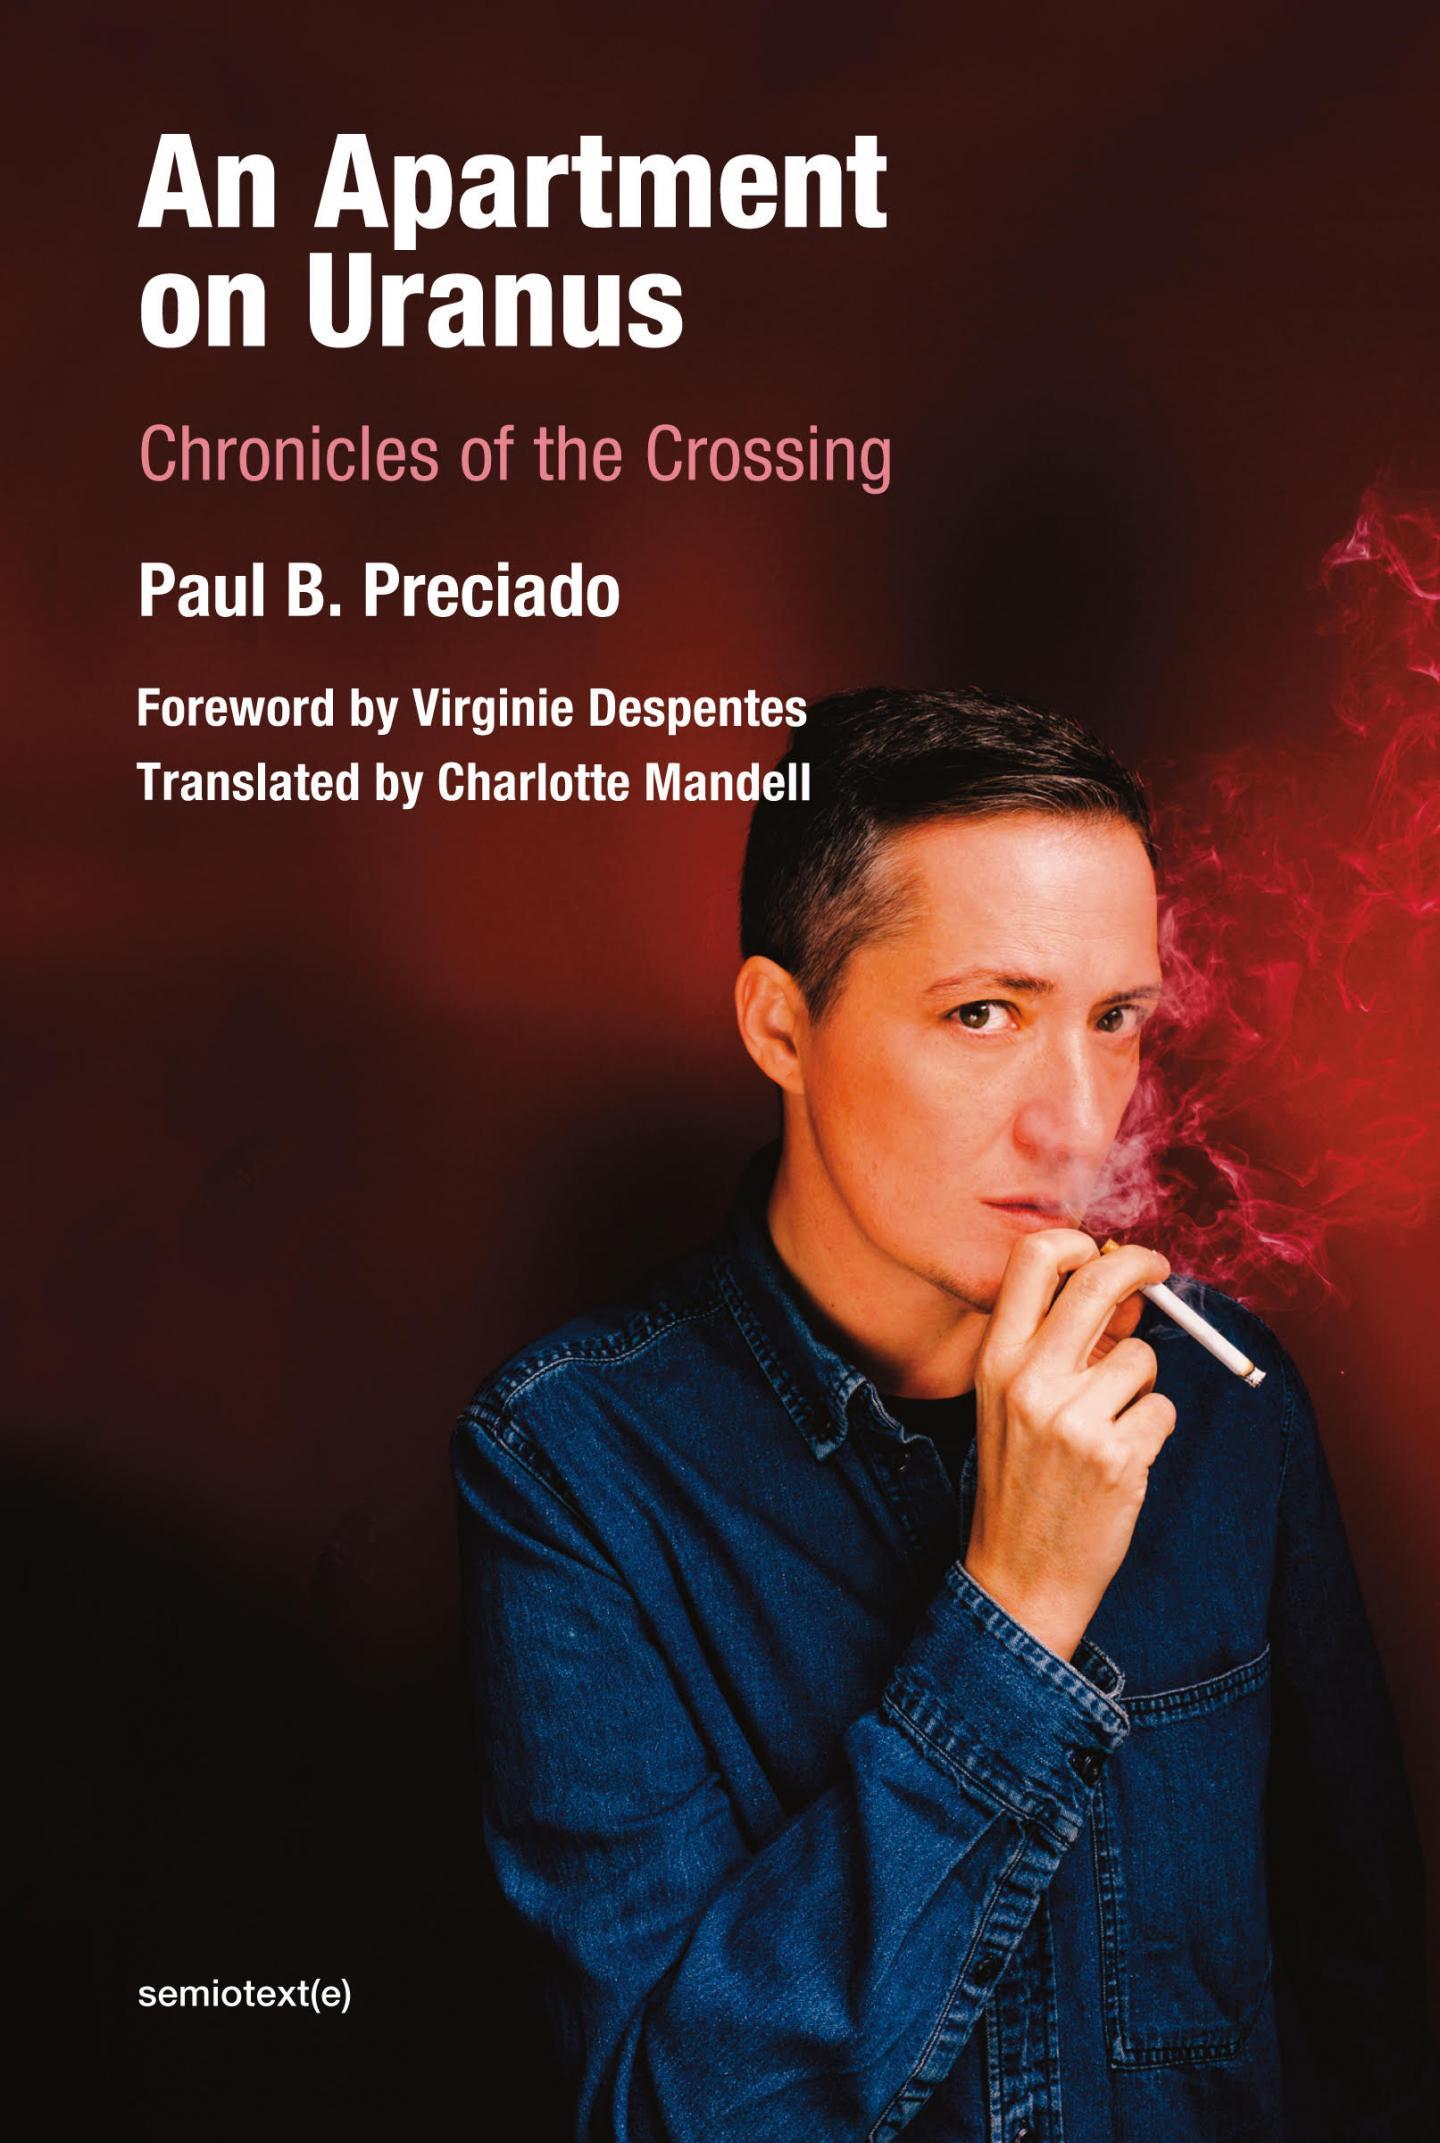 Paul B. Preciado, An Apartment on Uranus, book cover, 2020